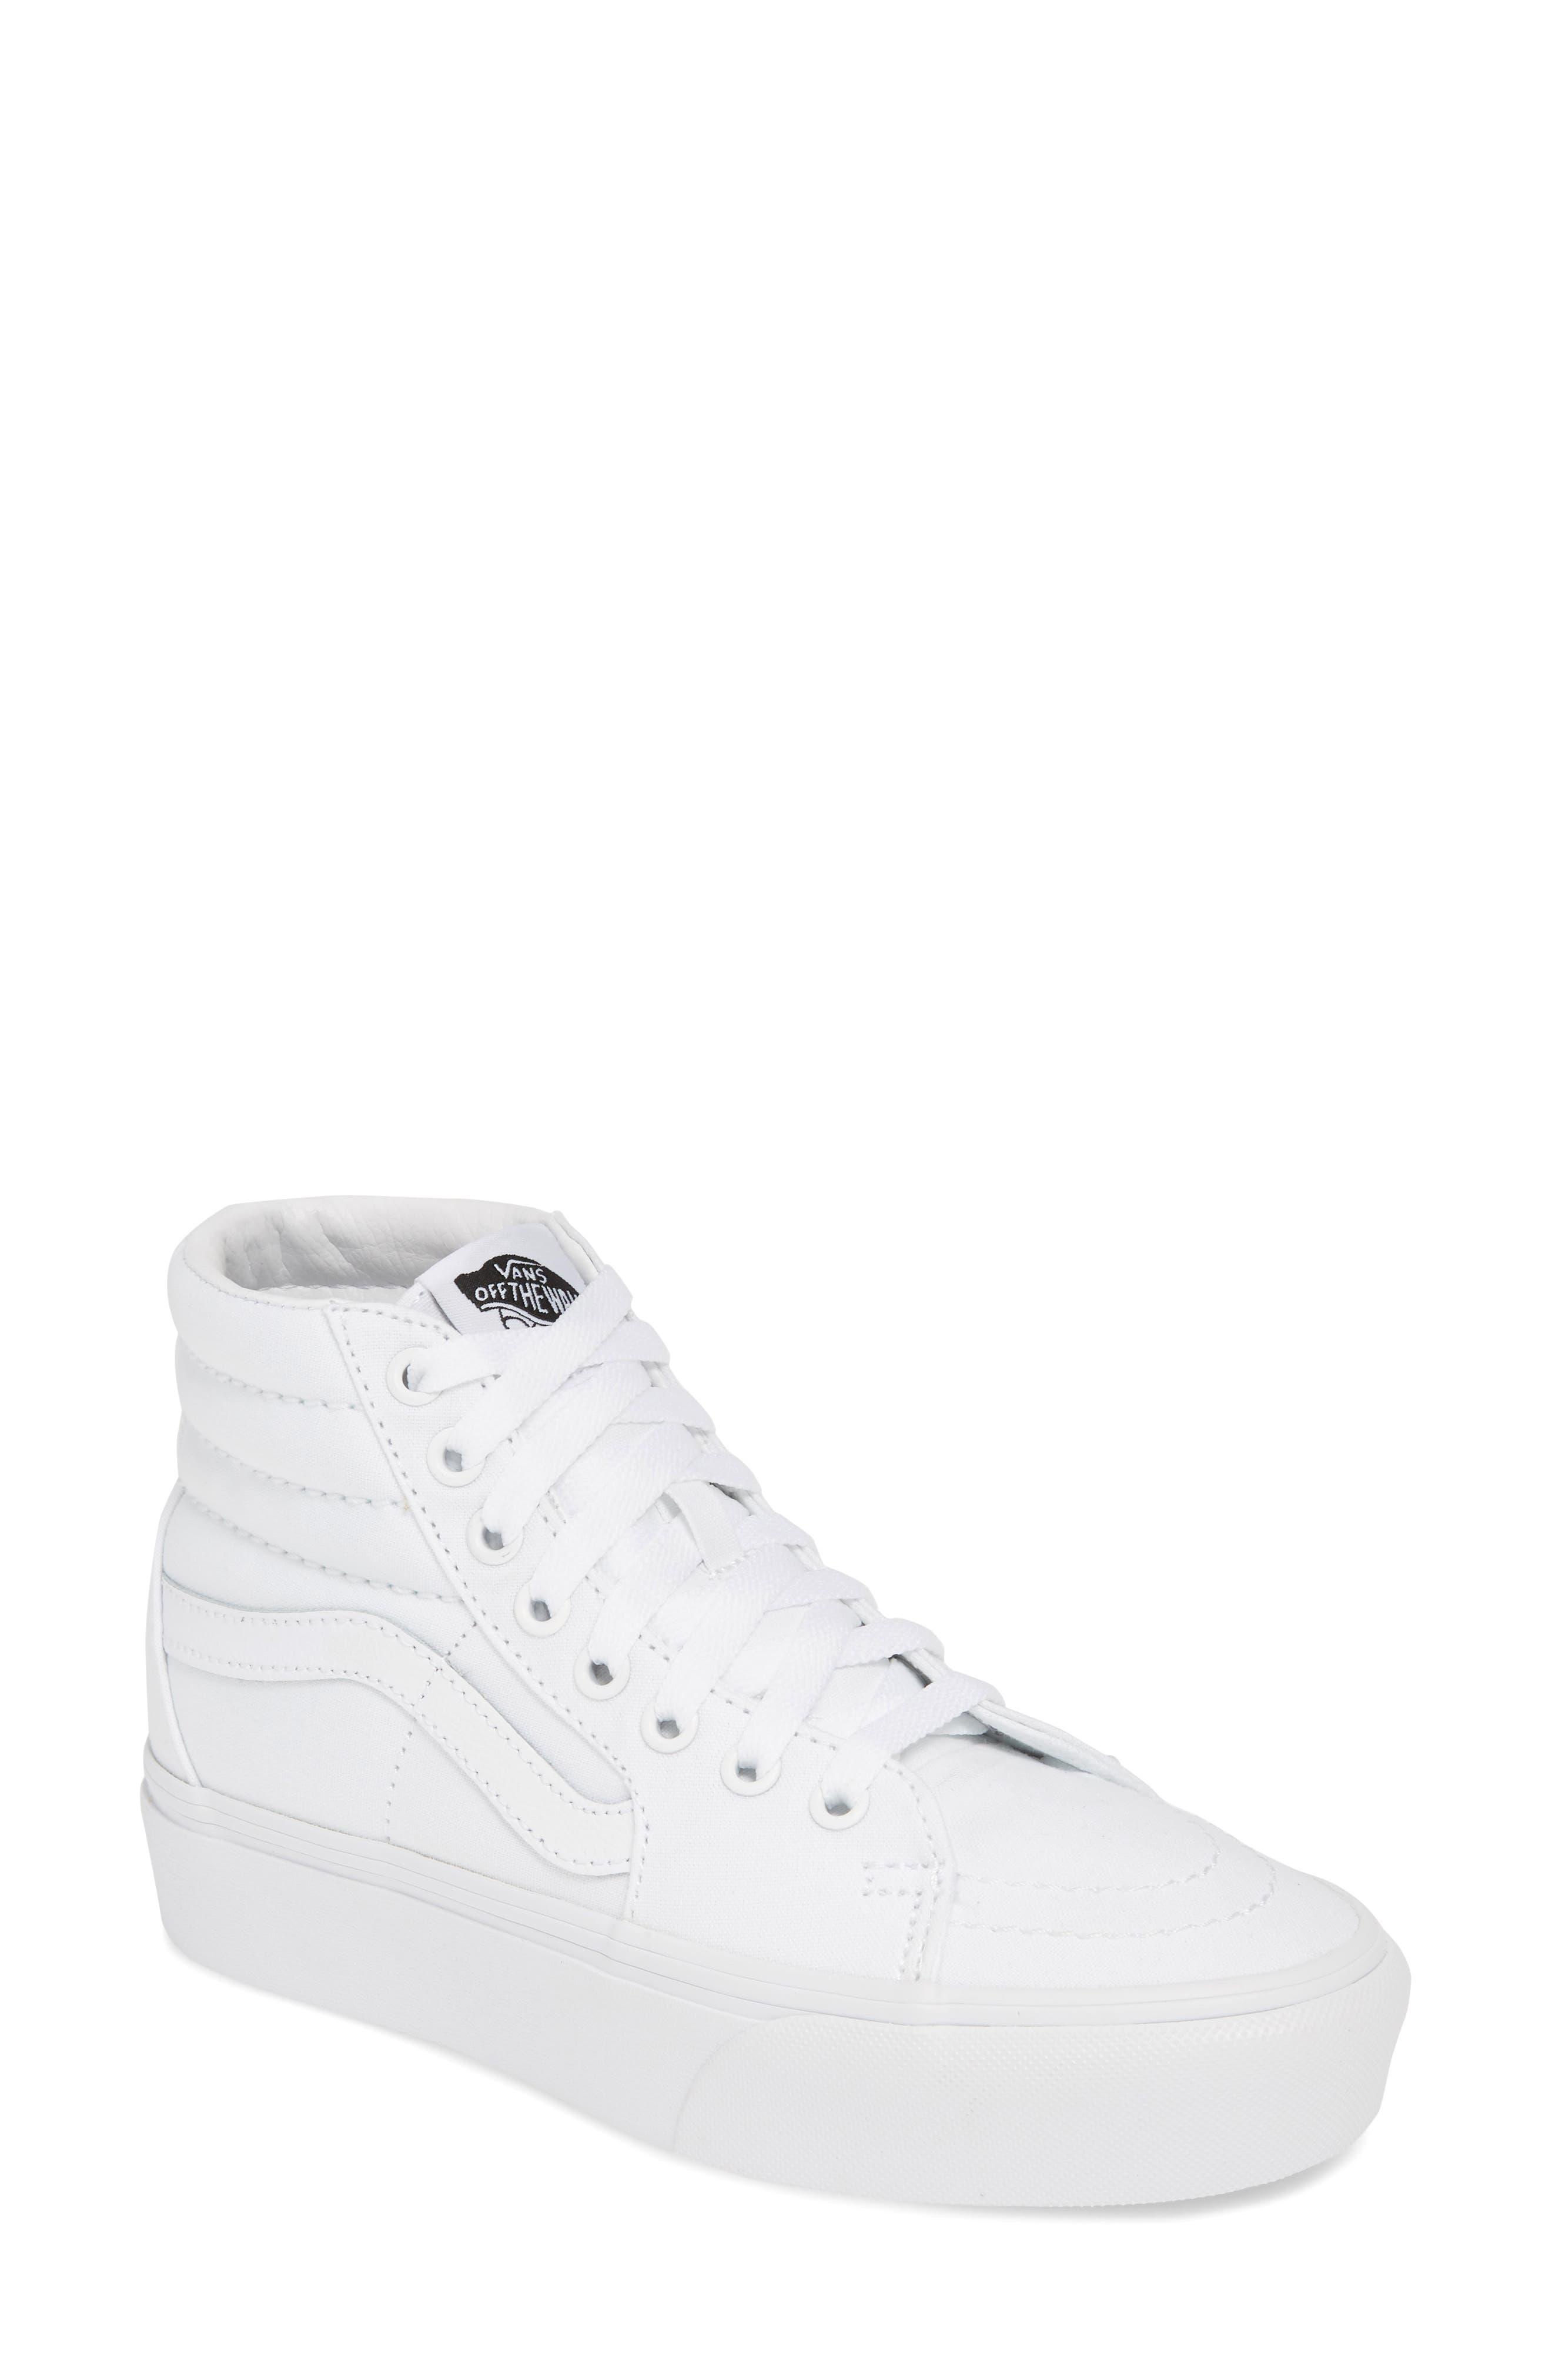 VANS, Sk8-Hi Platform Sneaker, Main thumbnail 1, color, TRUE WHITE/ TRUE WHITE